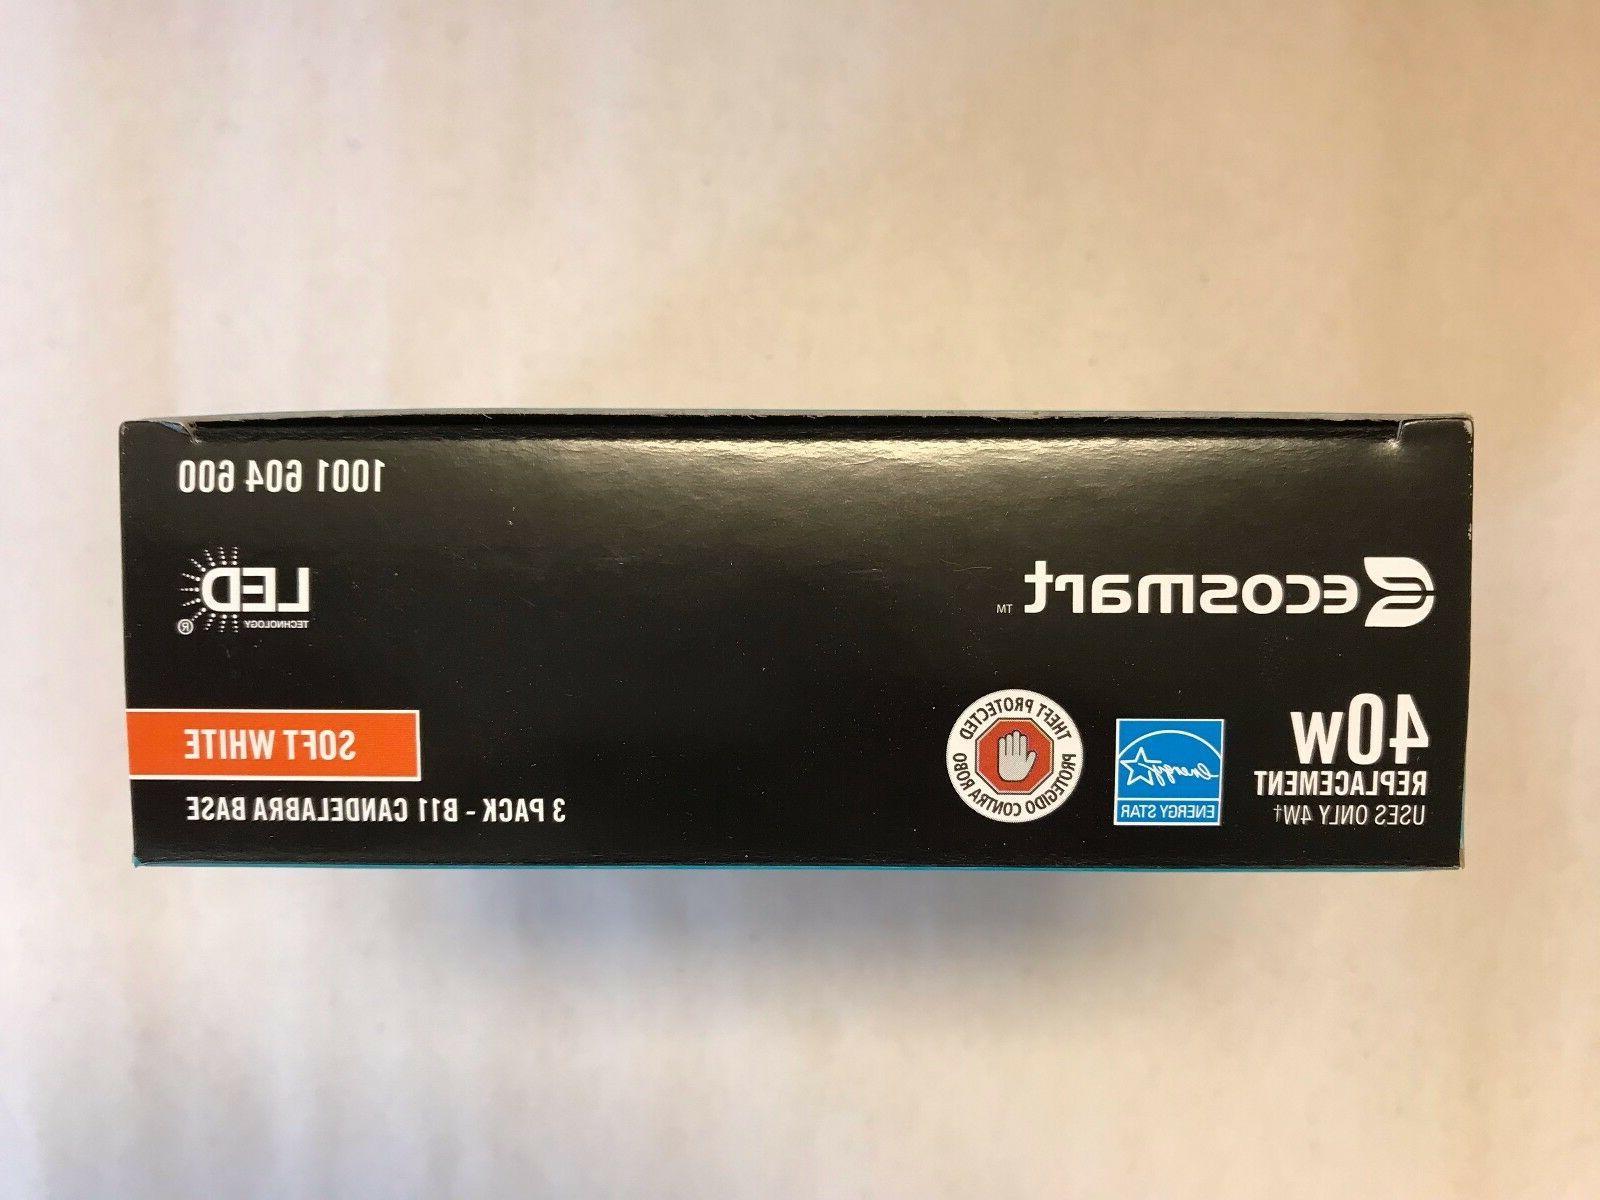 Ecosmart LED 4W Soft White DIMMABLE 40 Watt B11